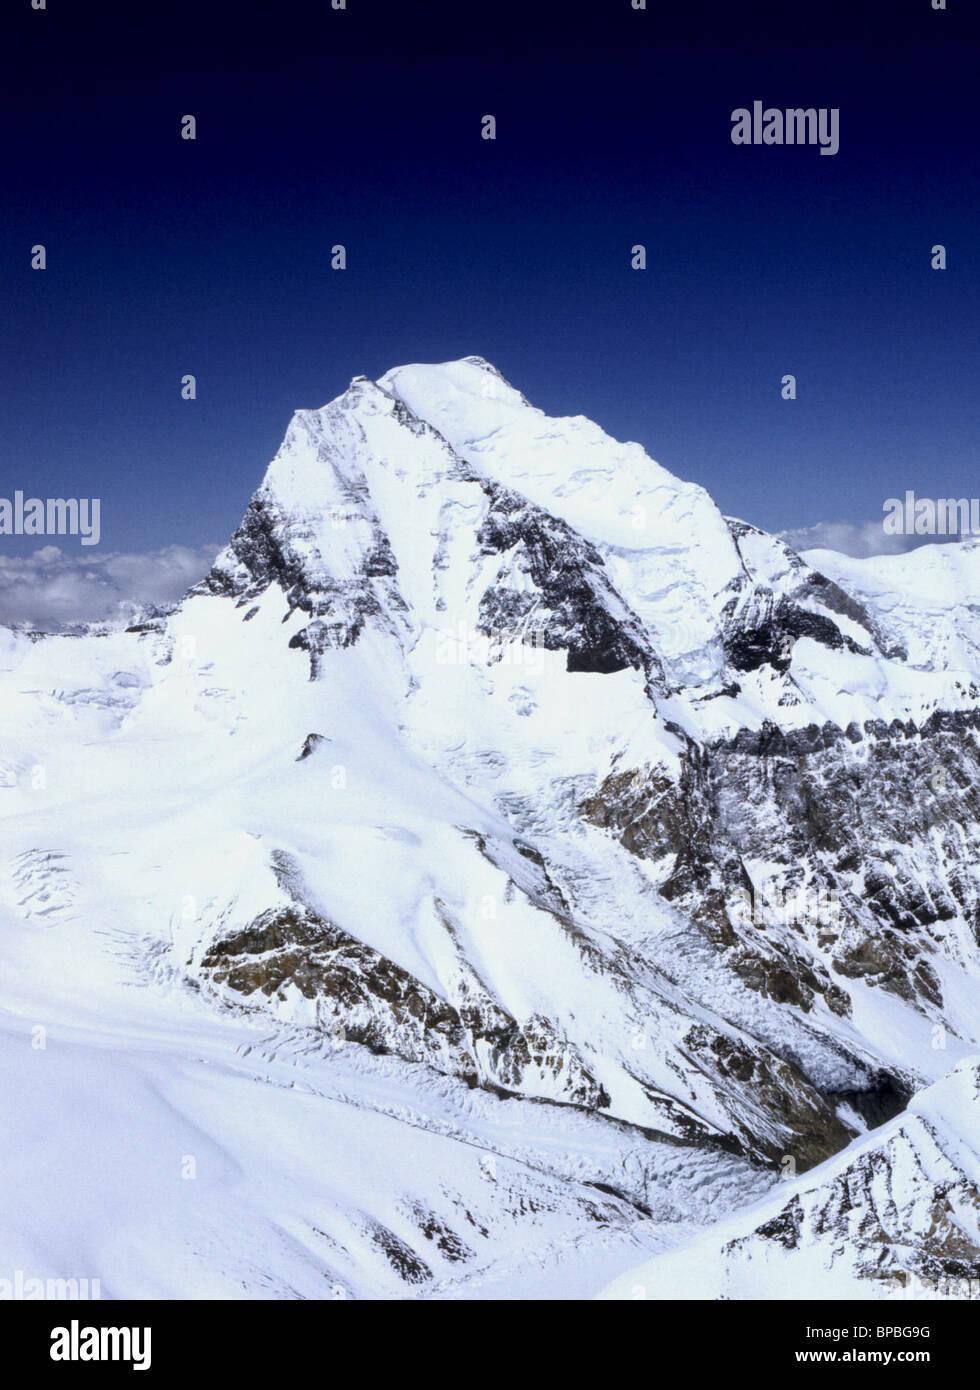 Ismoil Somoni Peak, former Peak of Communism in the Pamirs - Stock Image